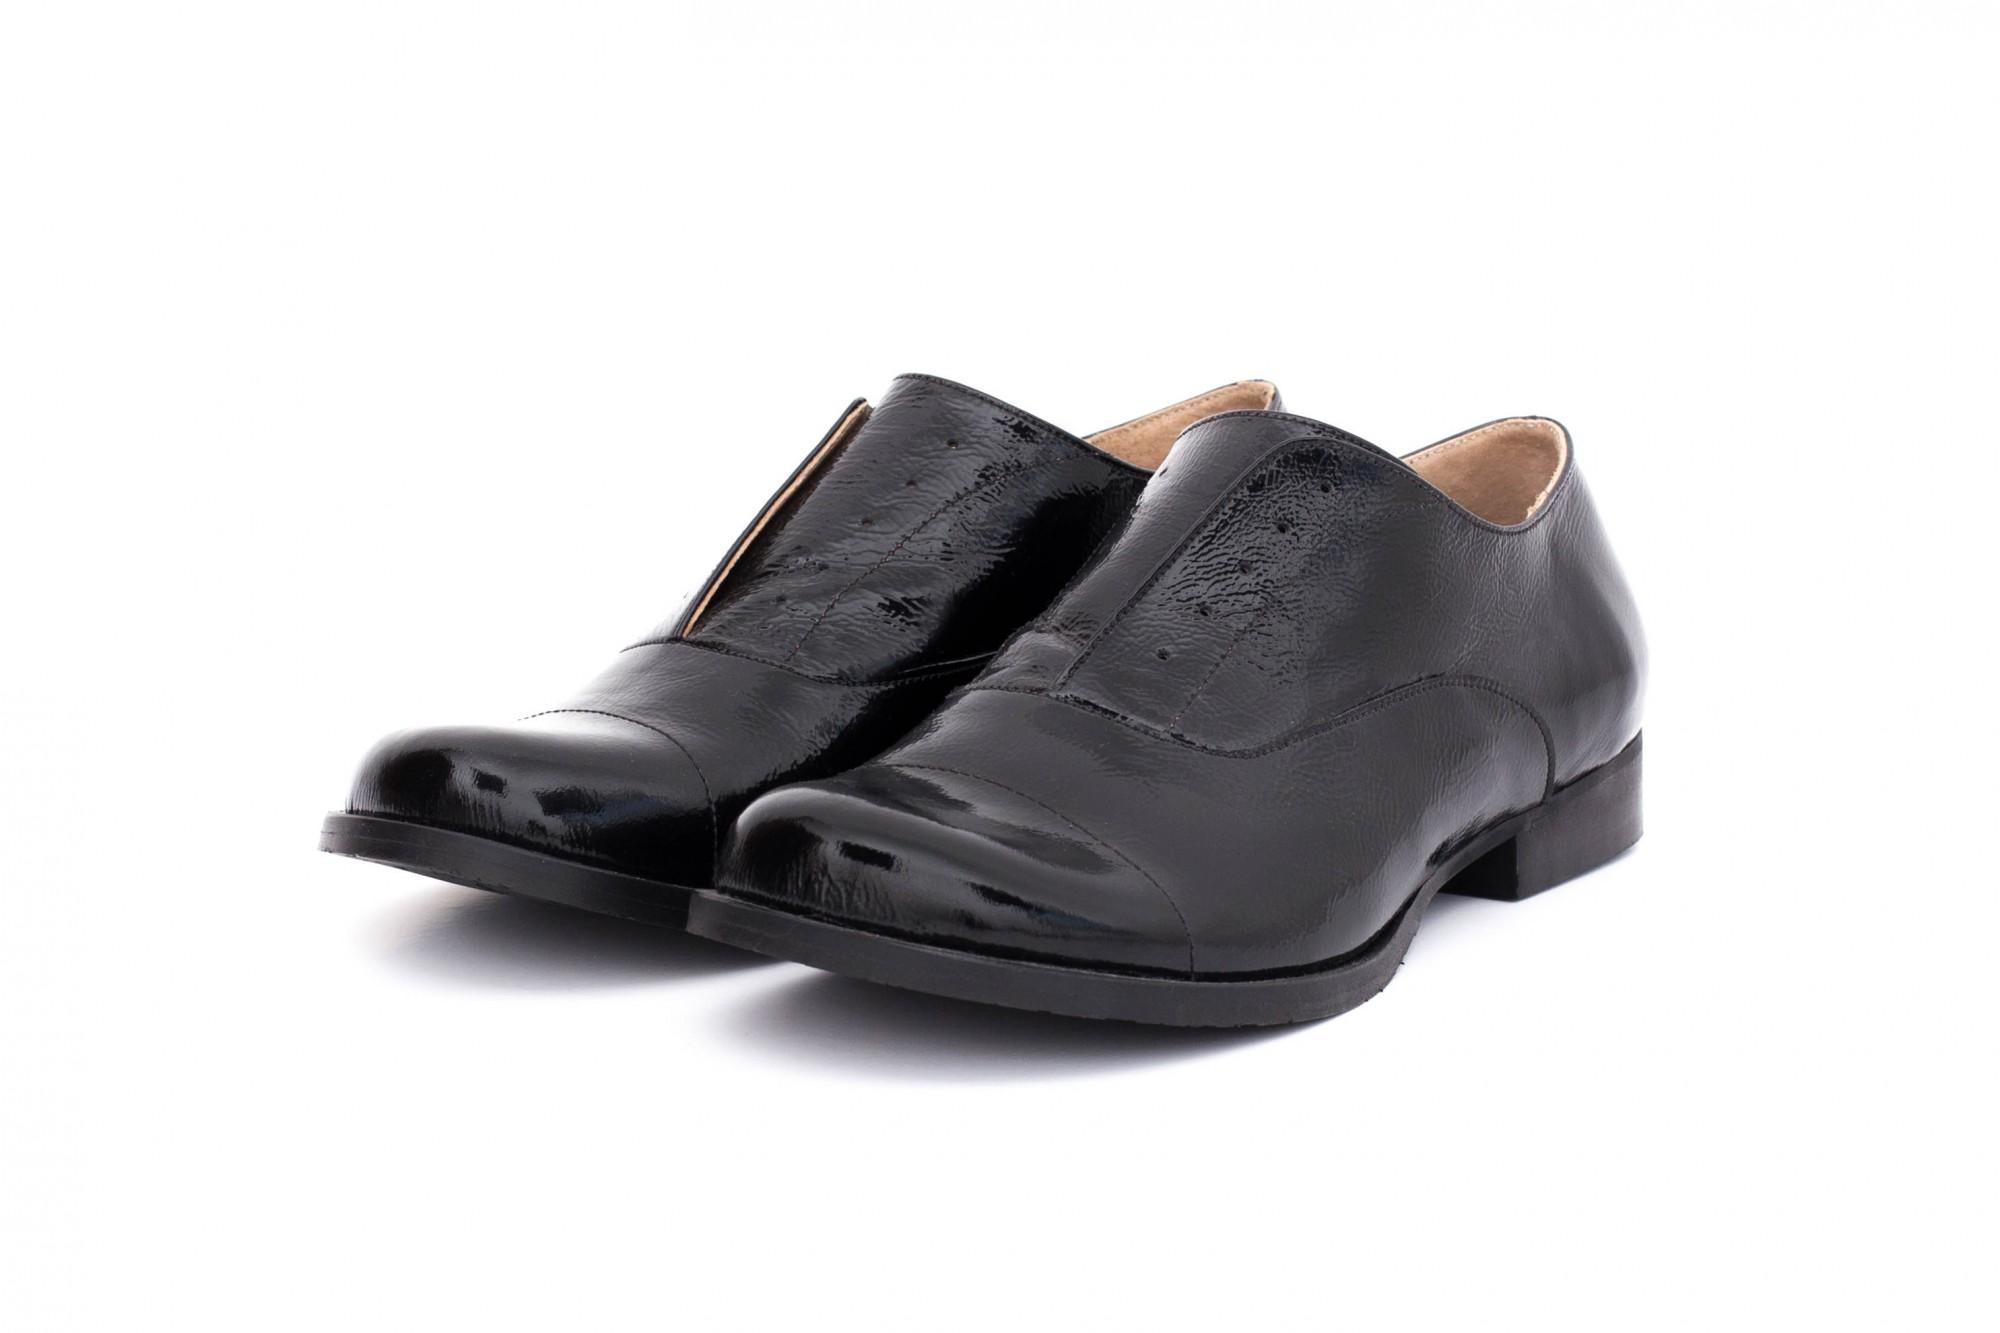 21fe792a9c7 ADI KILAV - Handmade leather Shoes - Women s Leather Shoes ...